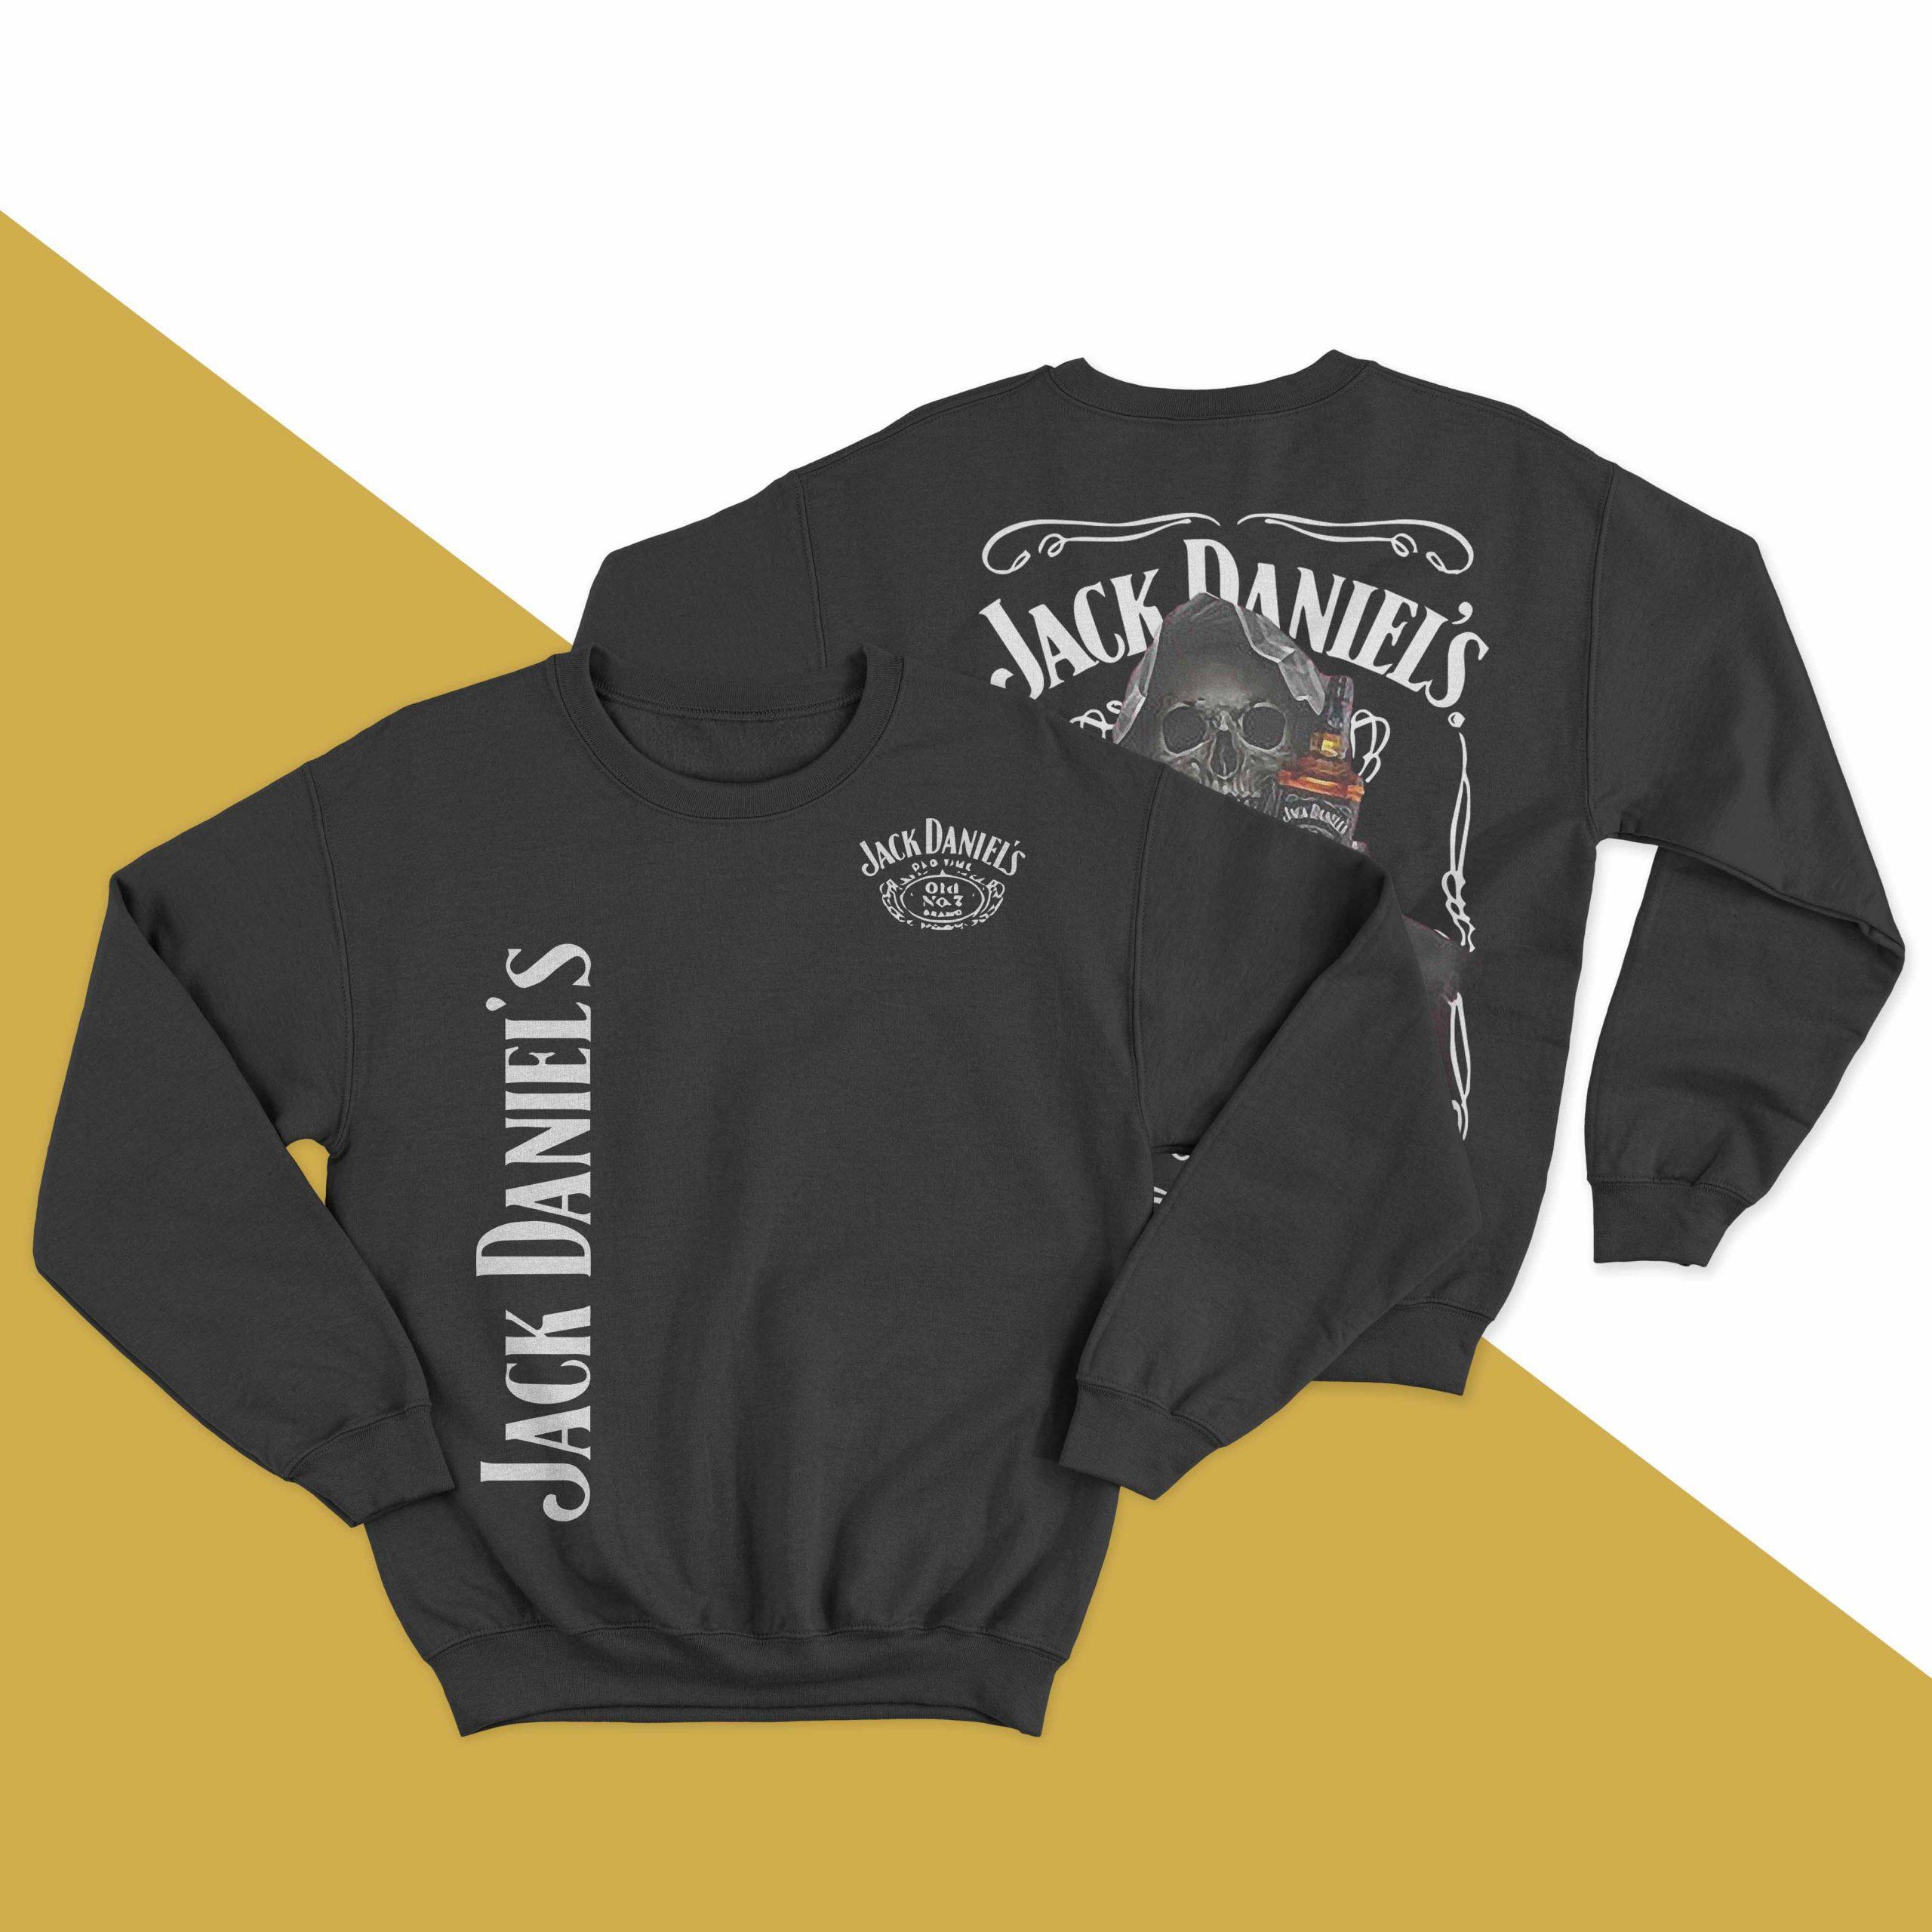 Death Jack Daniel's Tank Top